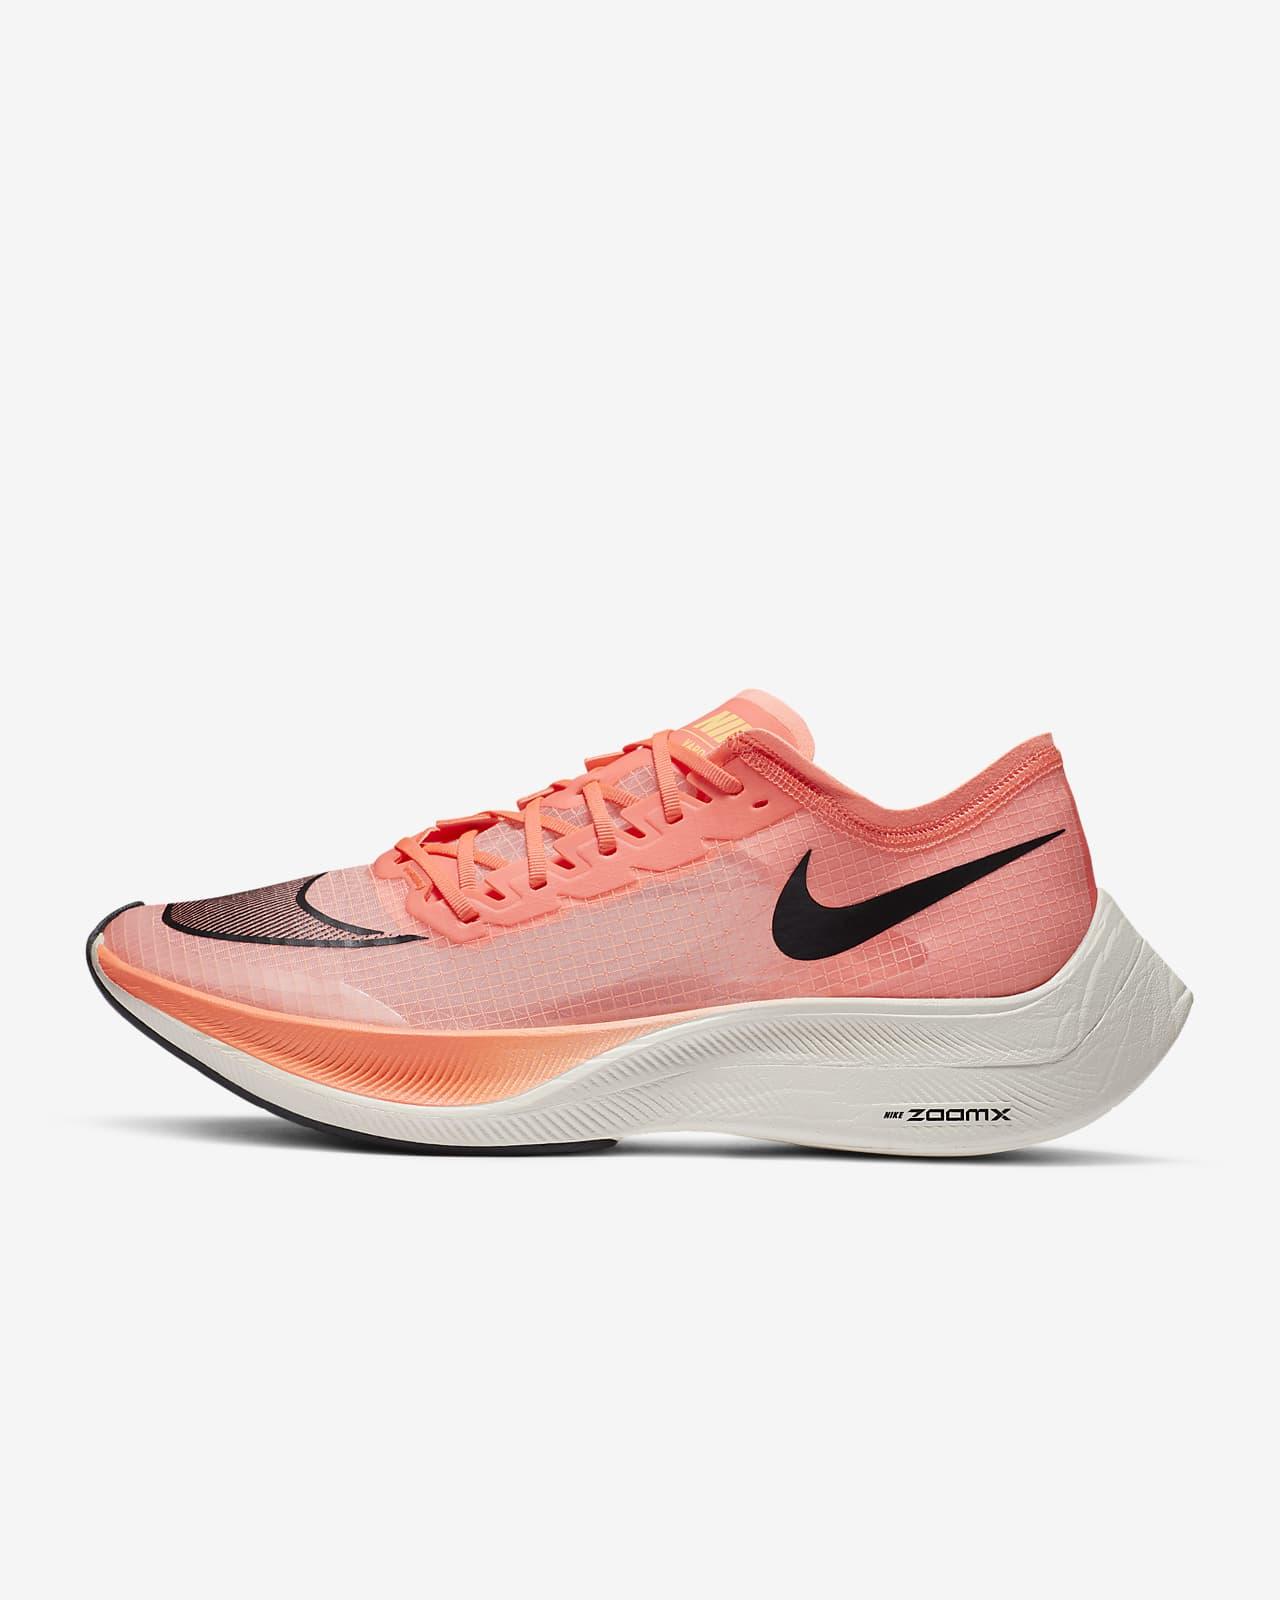 Scarpa da running Nike ZoomX Vaporfly NEXT%